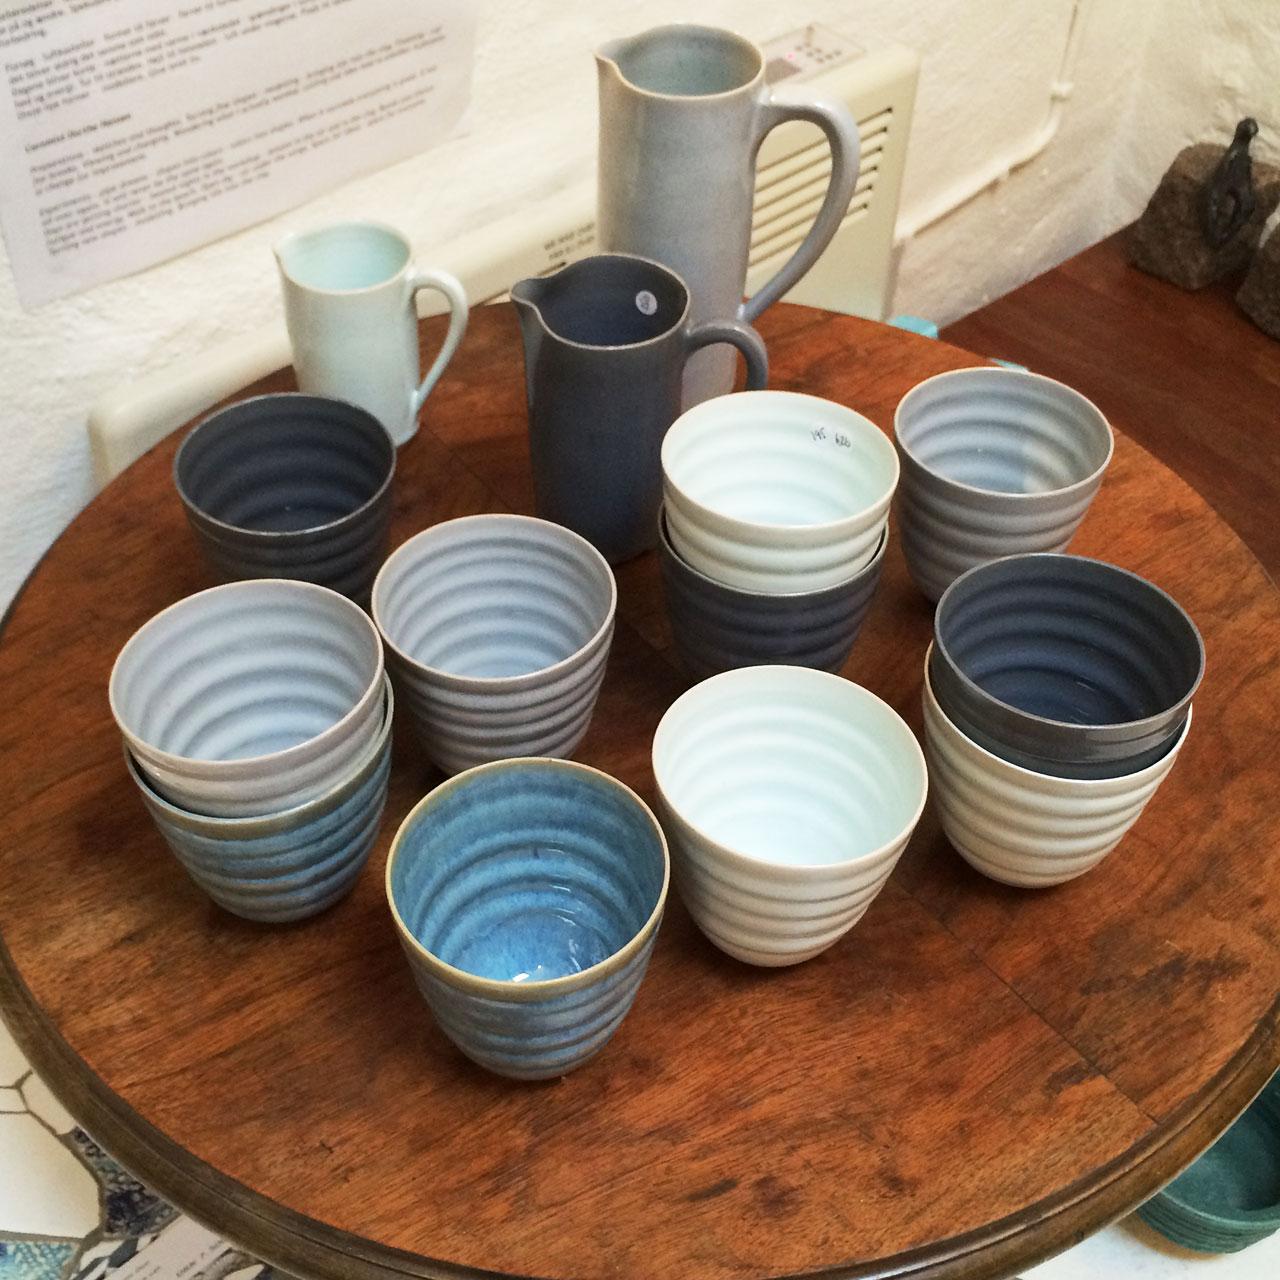 keramik århus Keramik krus århus – Design et barns værelse keramik århus